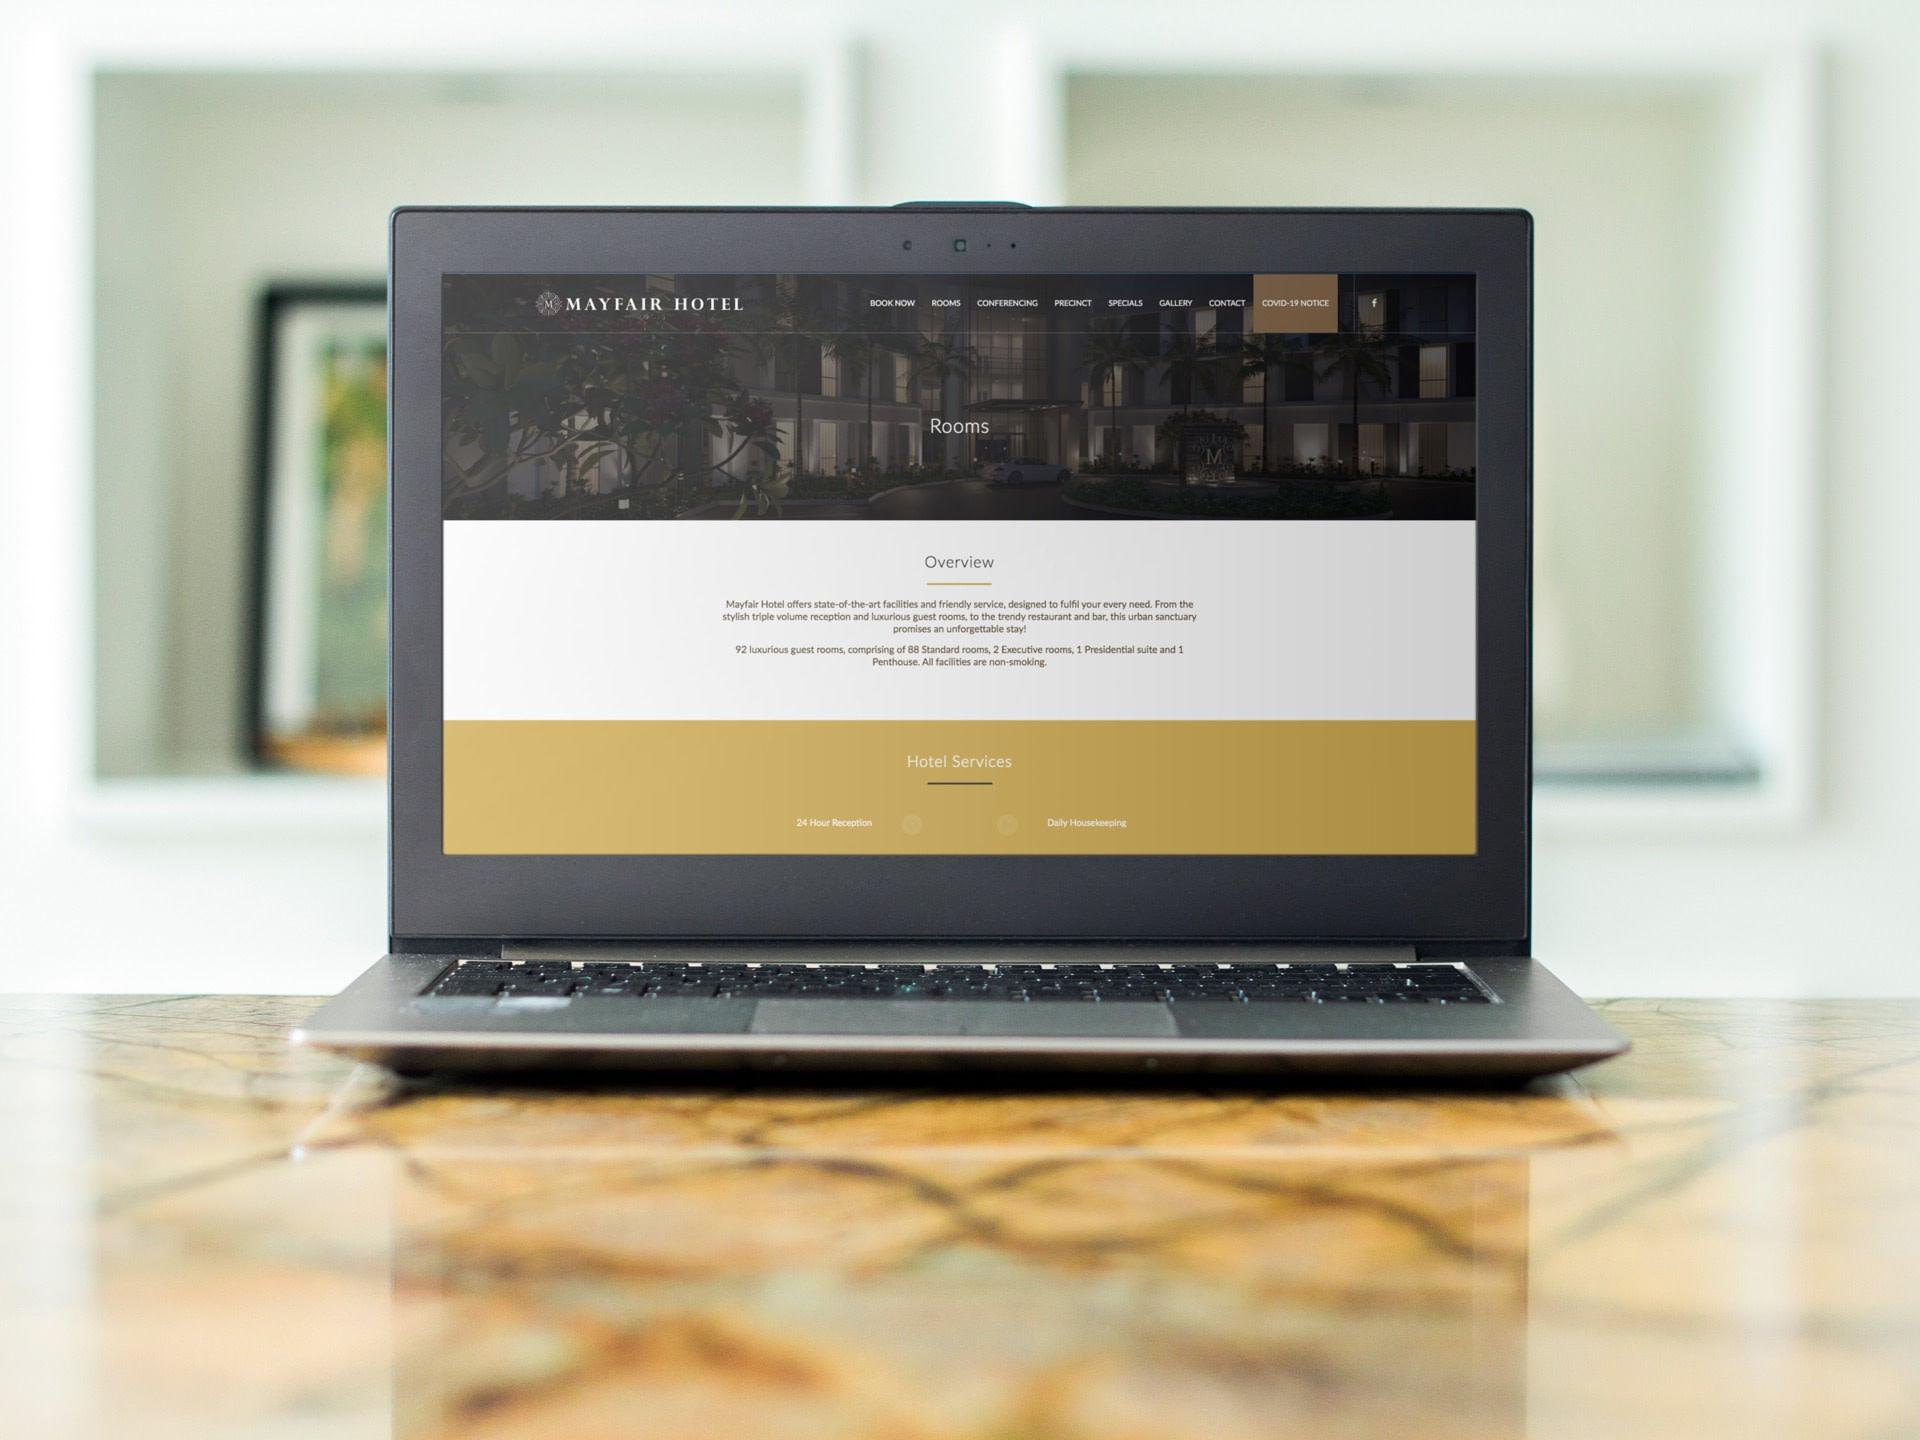 Mayfair Hotel Website (Laptop)   KEMOSO